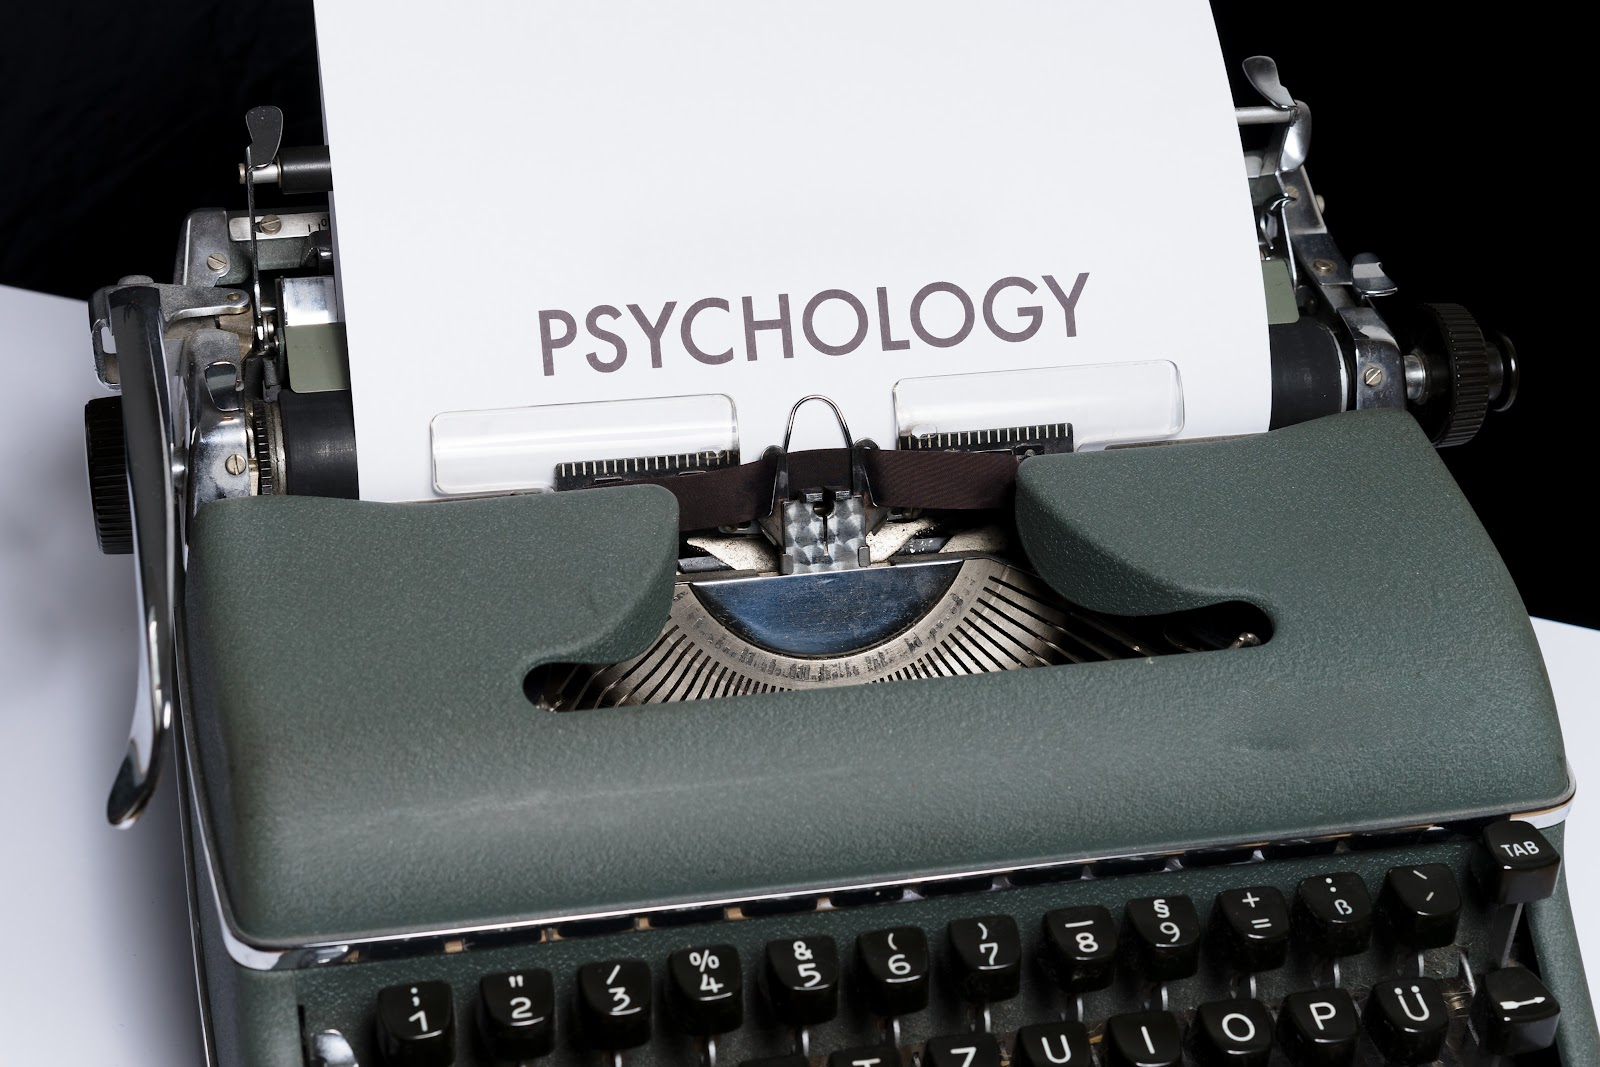 17+ types of psychology (a short presentation)